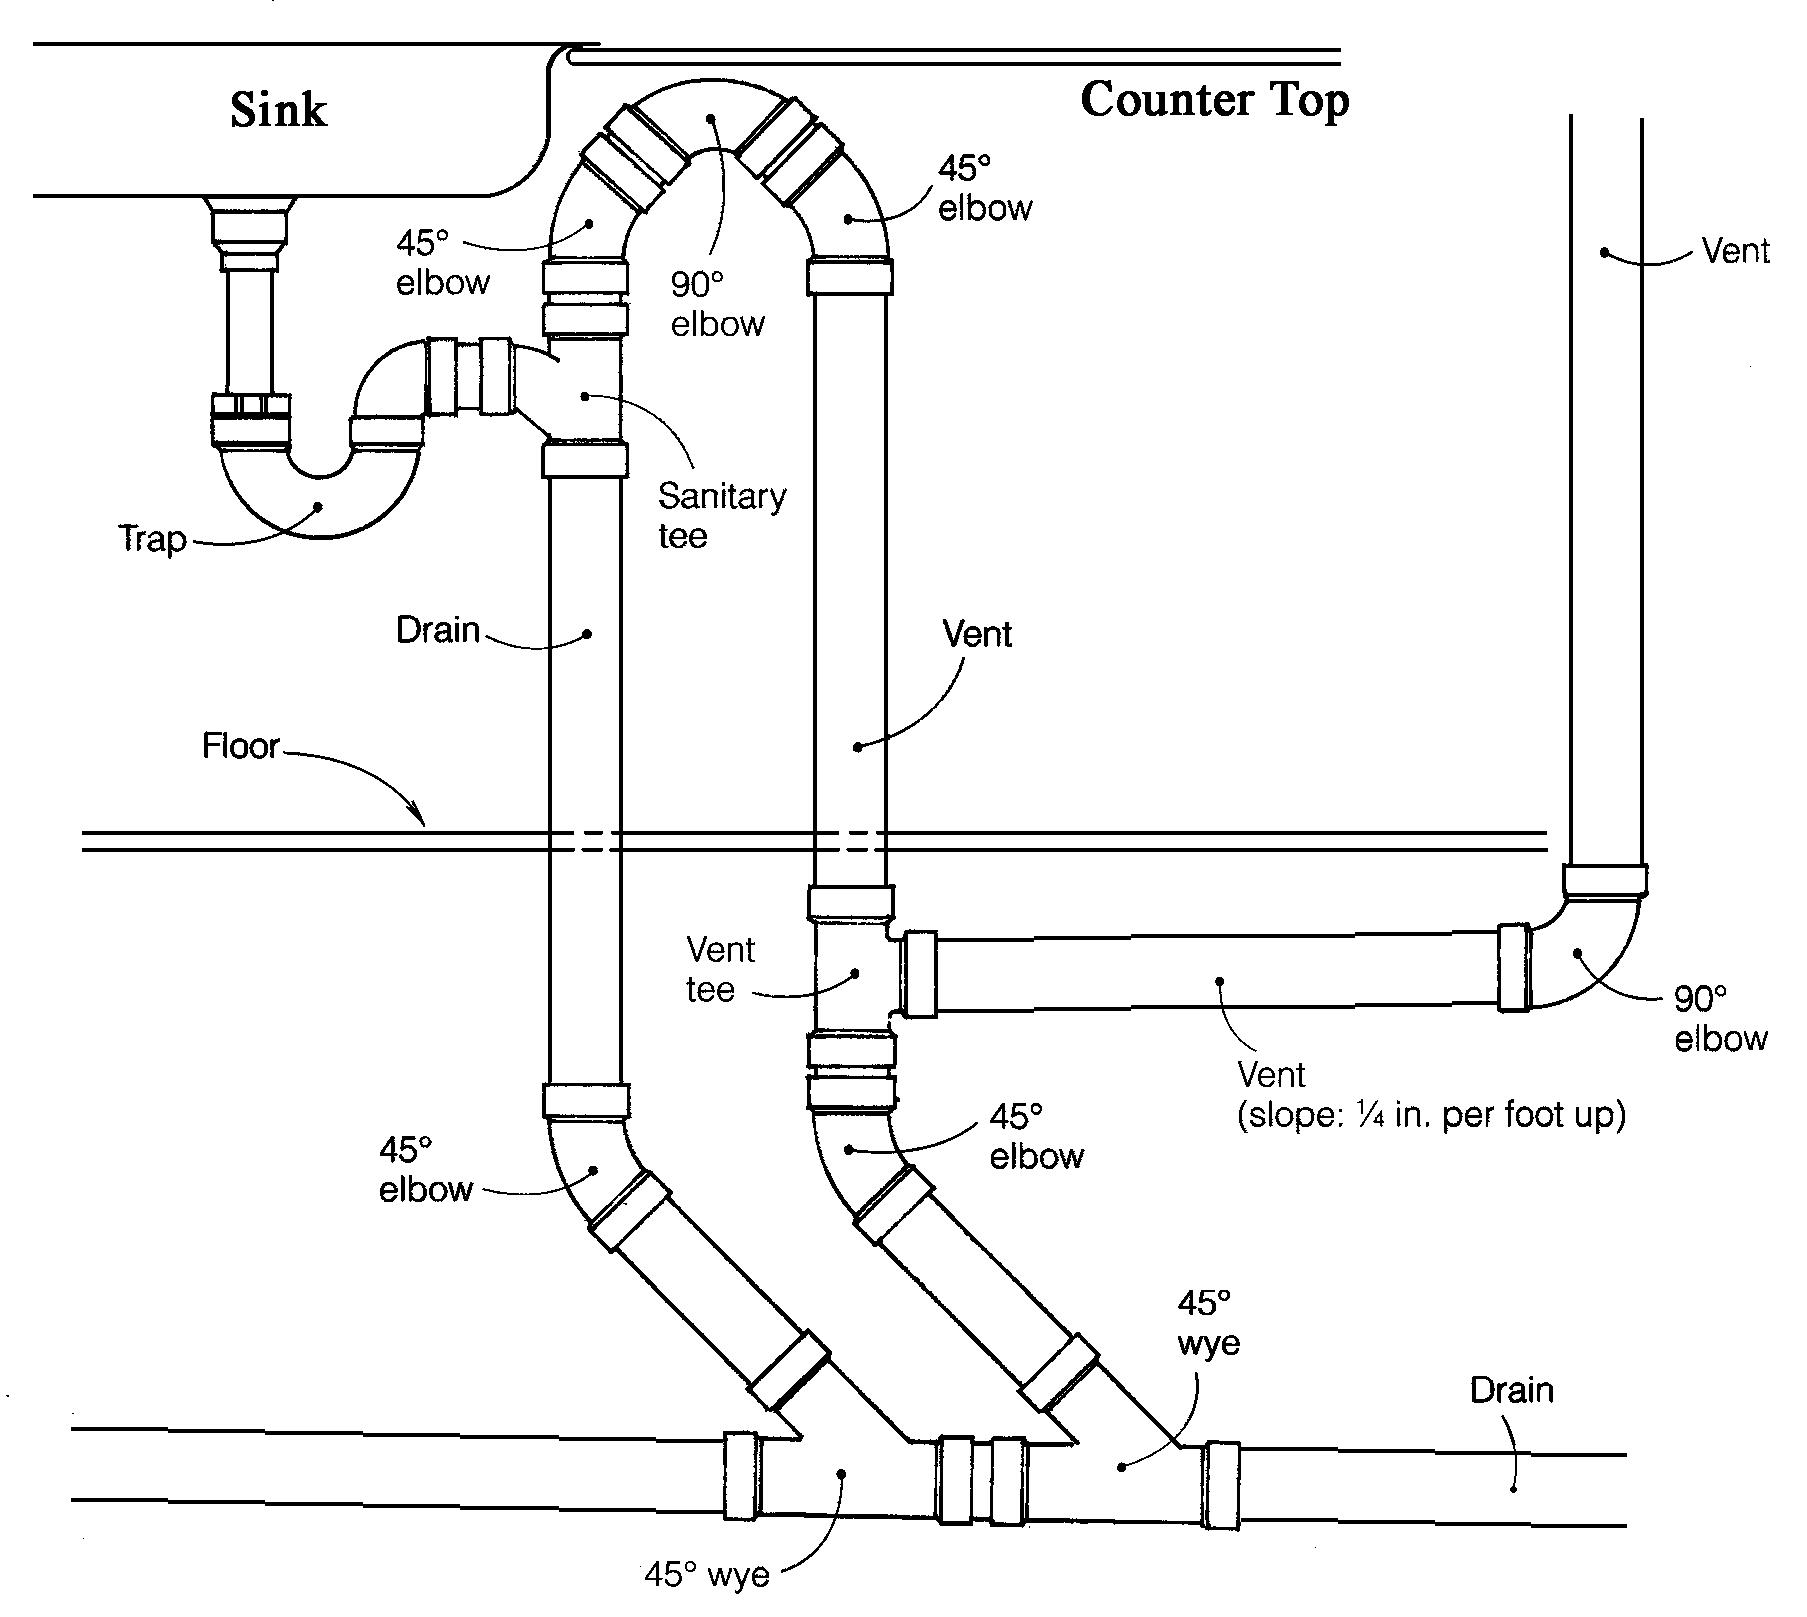 medium resolution of pluislandsink tiny house plumbing vent bathroom plumbing plumbing vent diagram tiny house plumbing pinterest plumbing